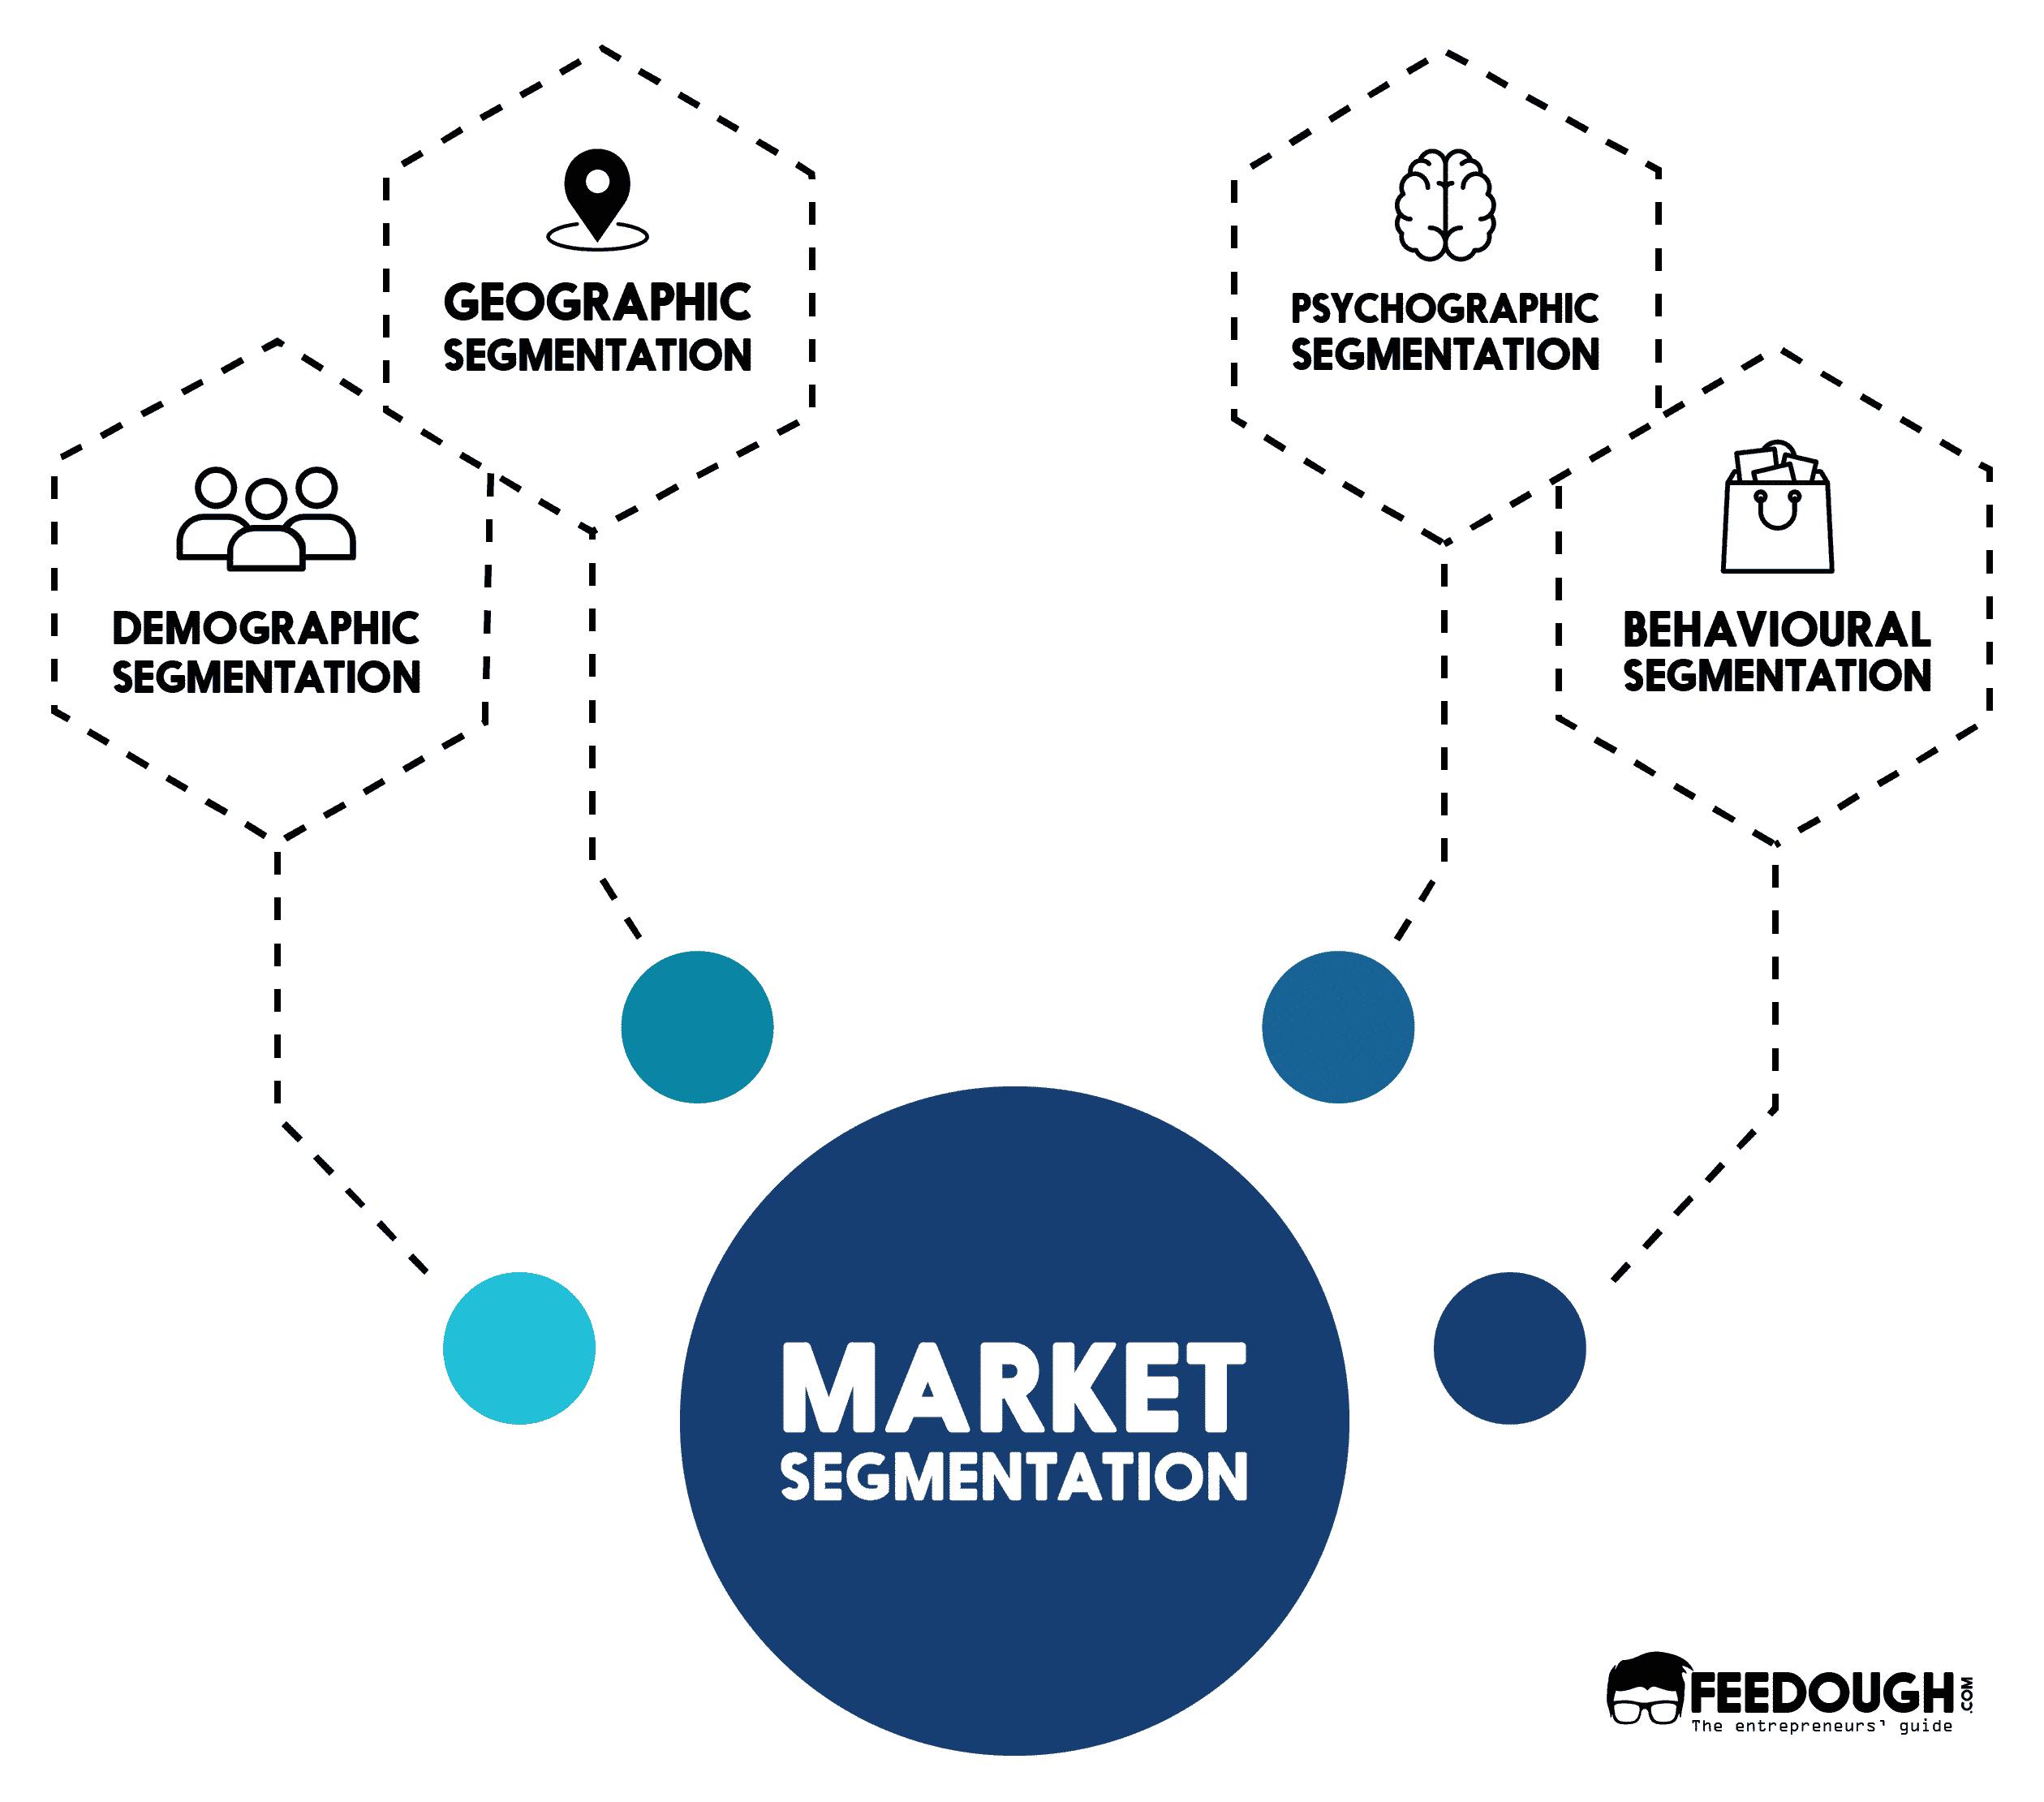 Four levels of market segmentation